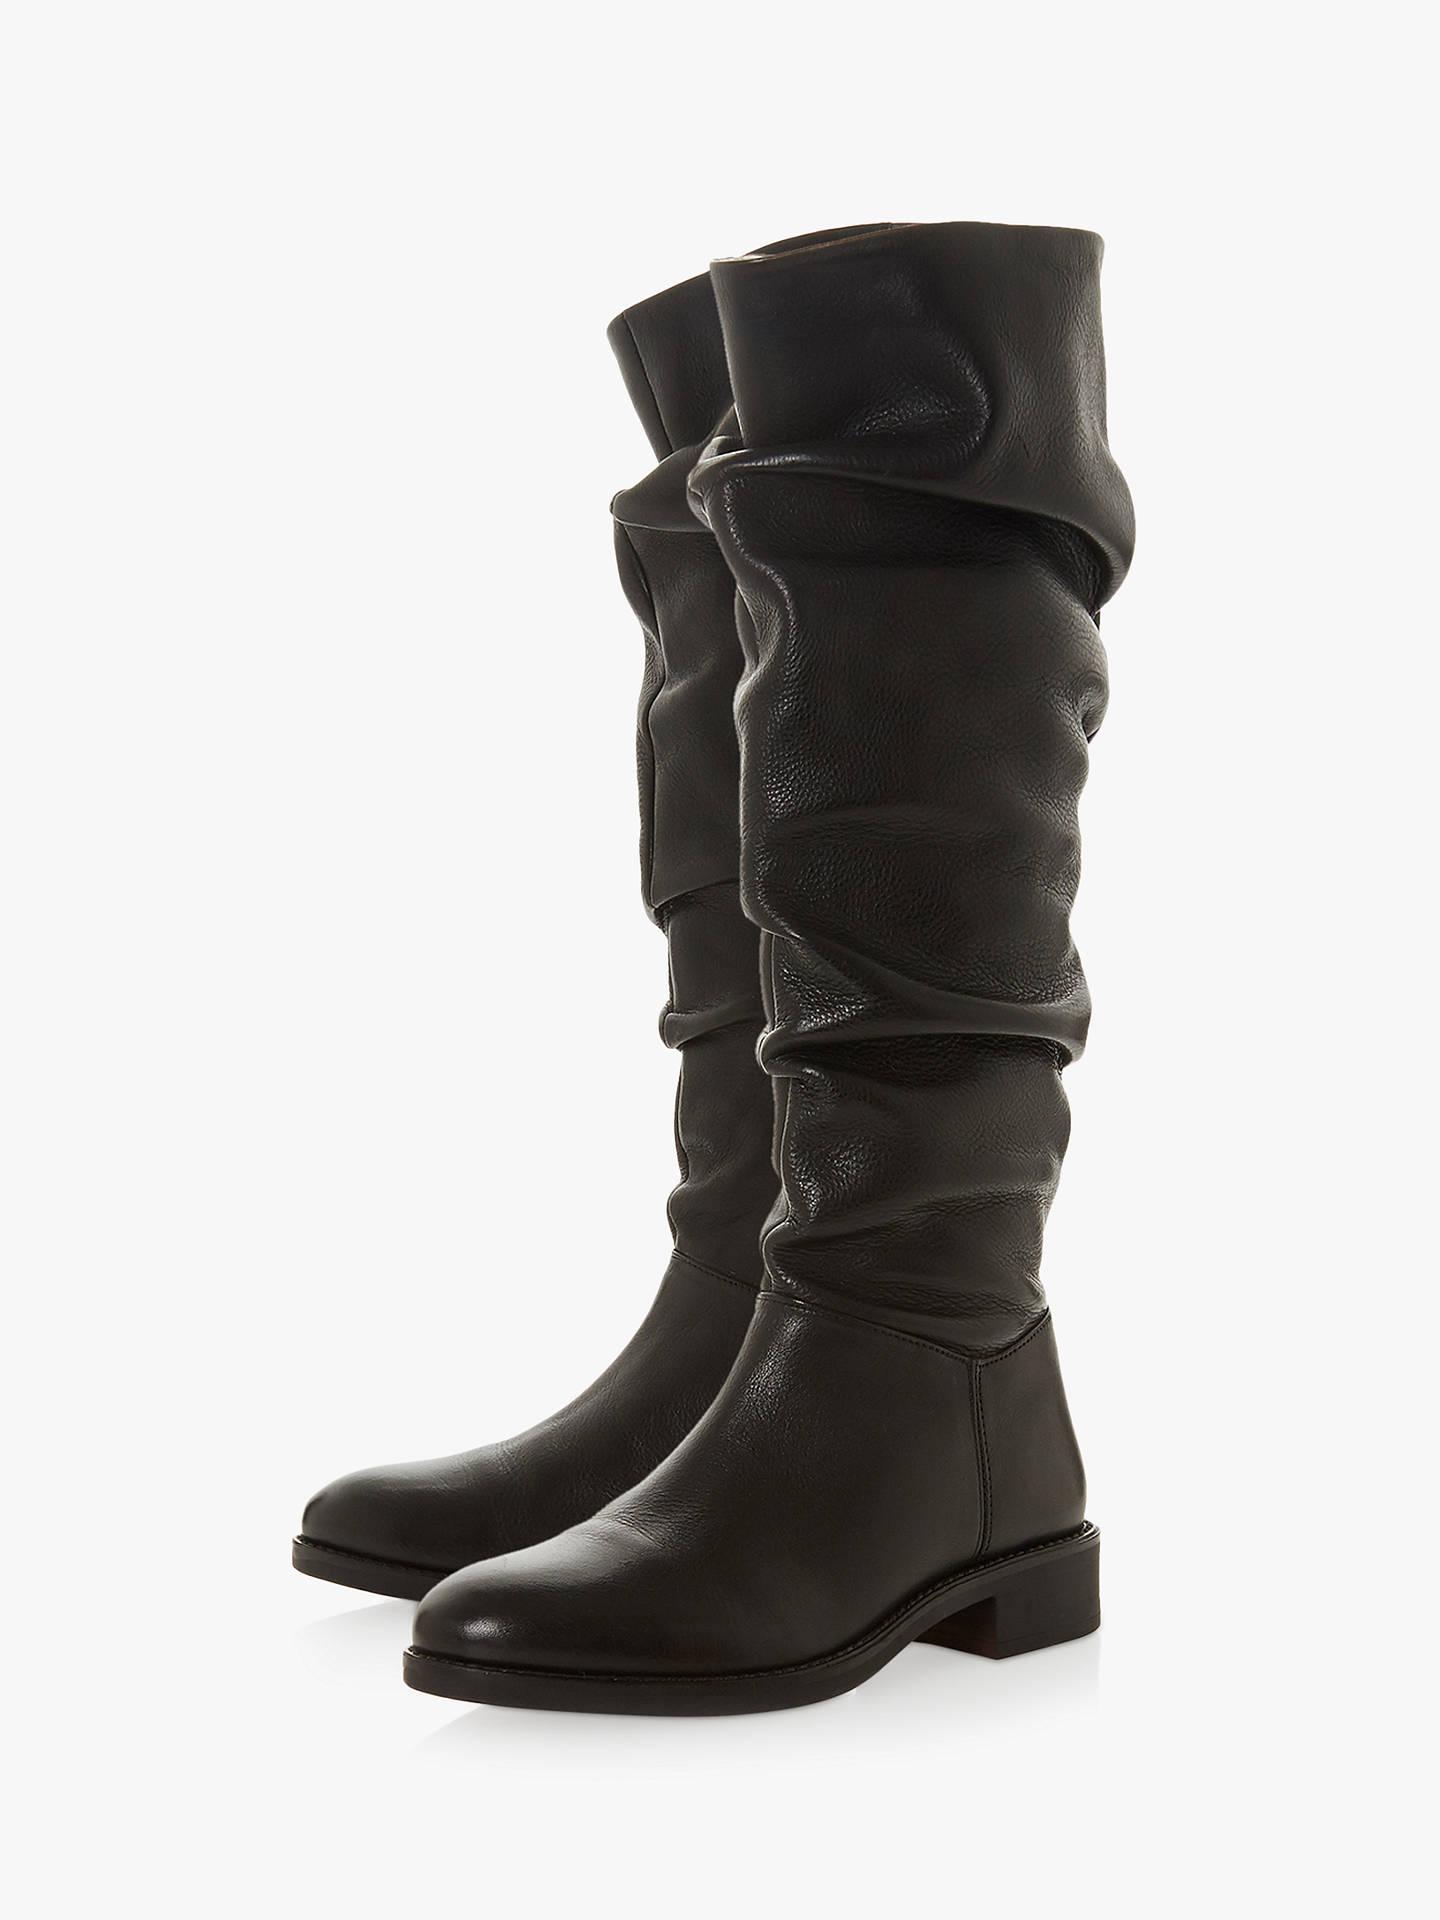 79b0c04e9e6 Dune Tabby Ruched Block Heel Long Boots at John Lewis & Partners